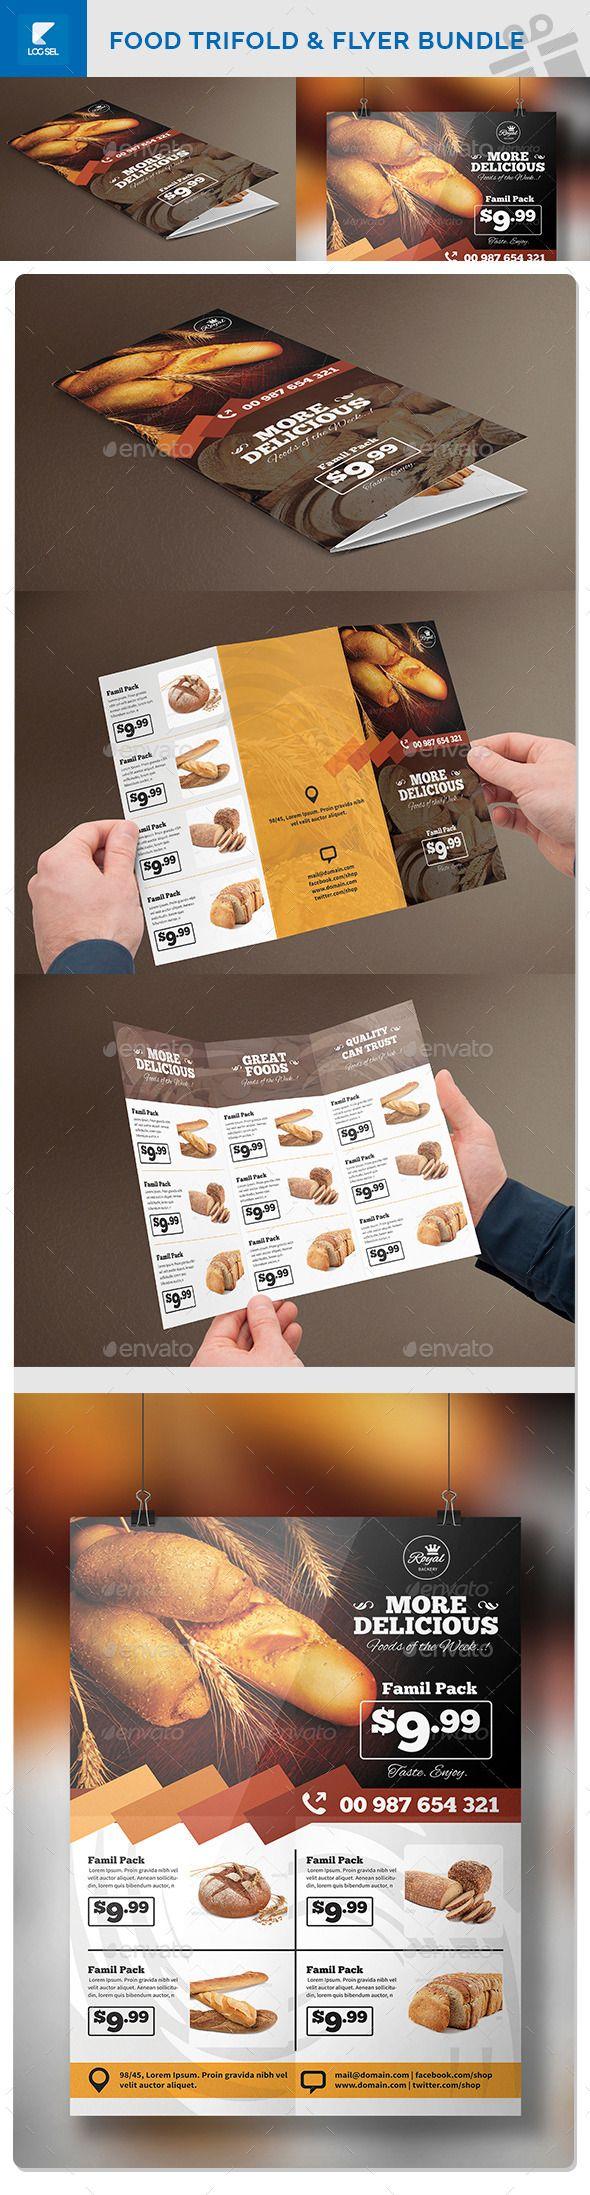 Food Trifold & Flyer Bundle - Food Menus Print Templates